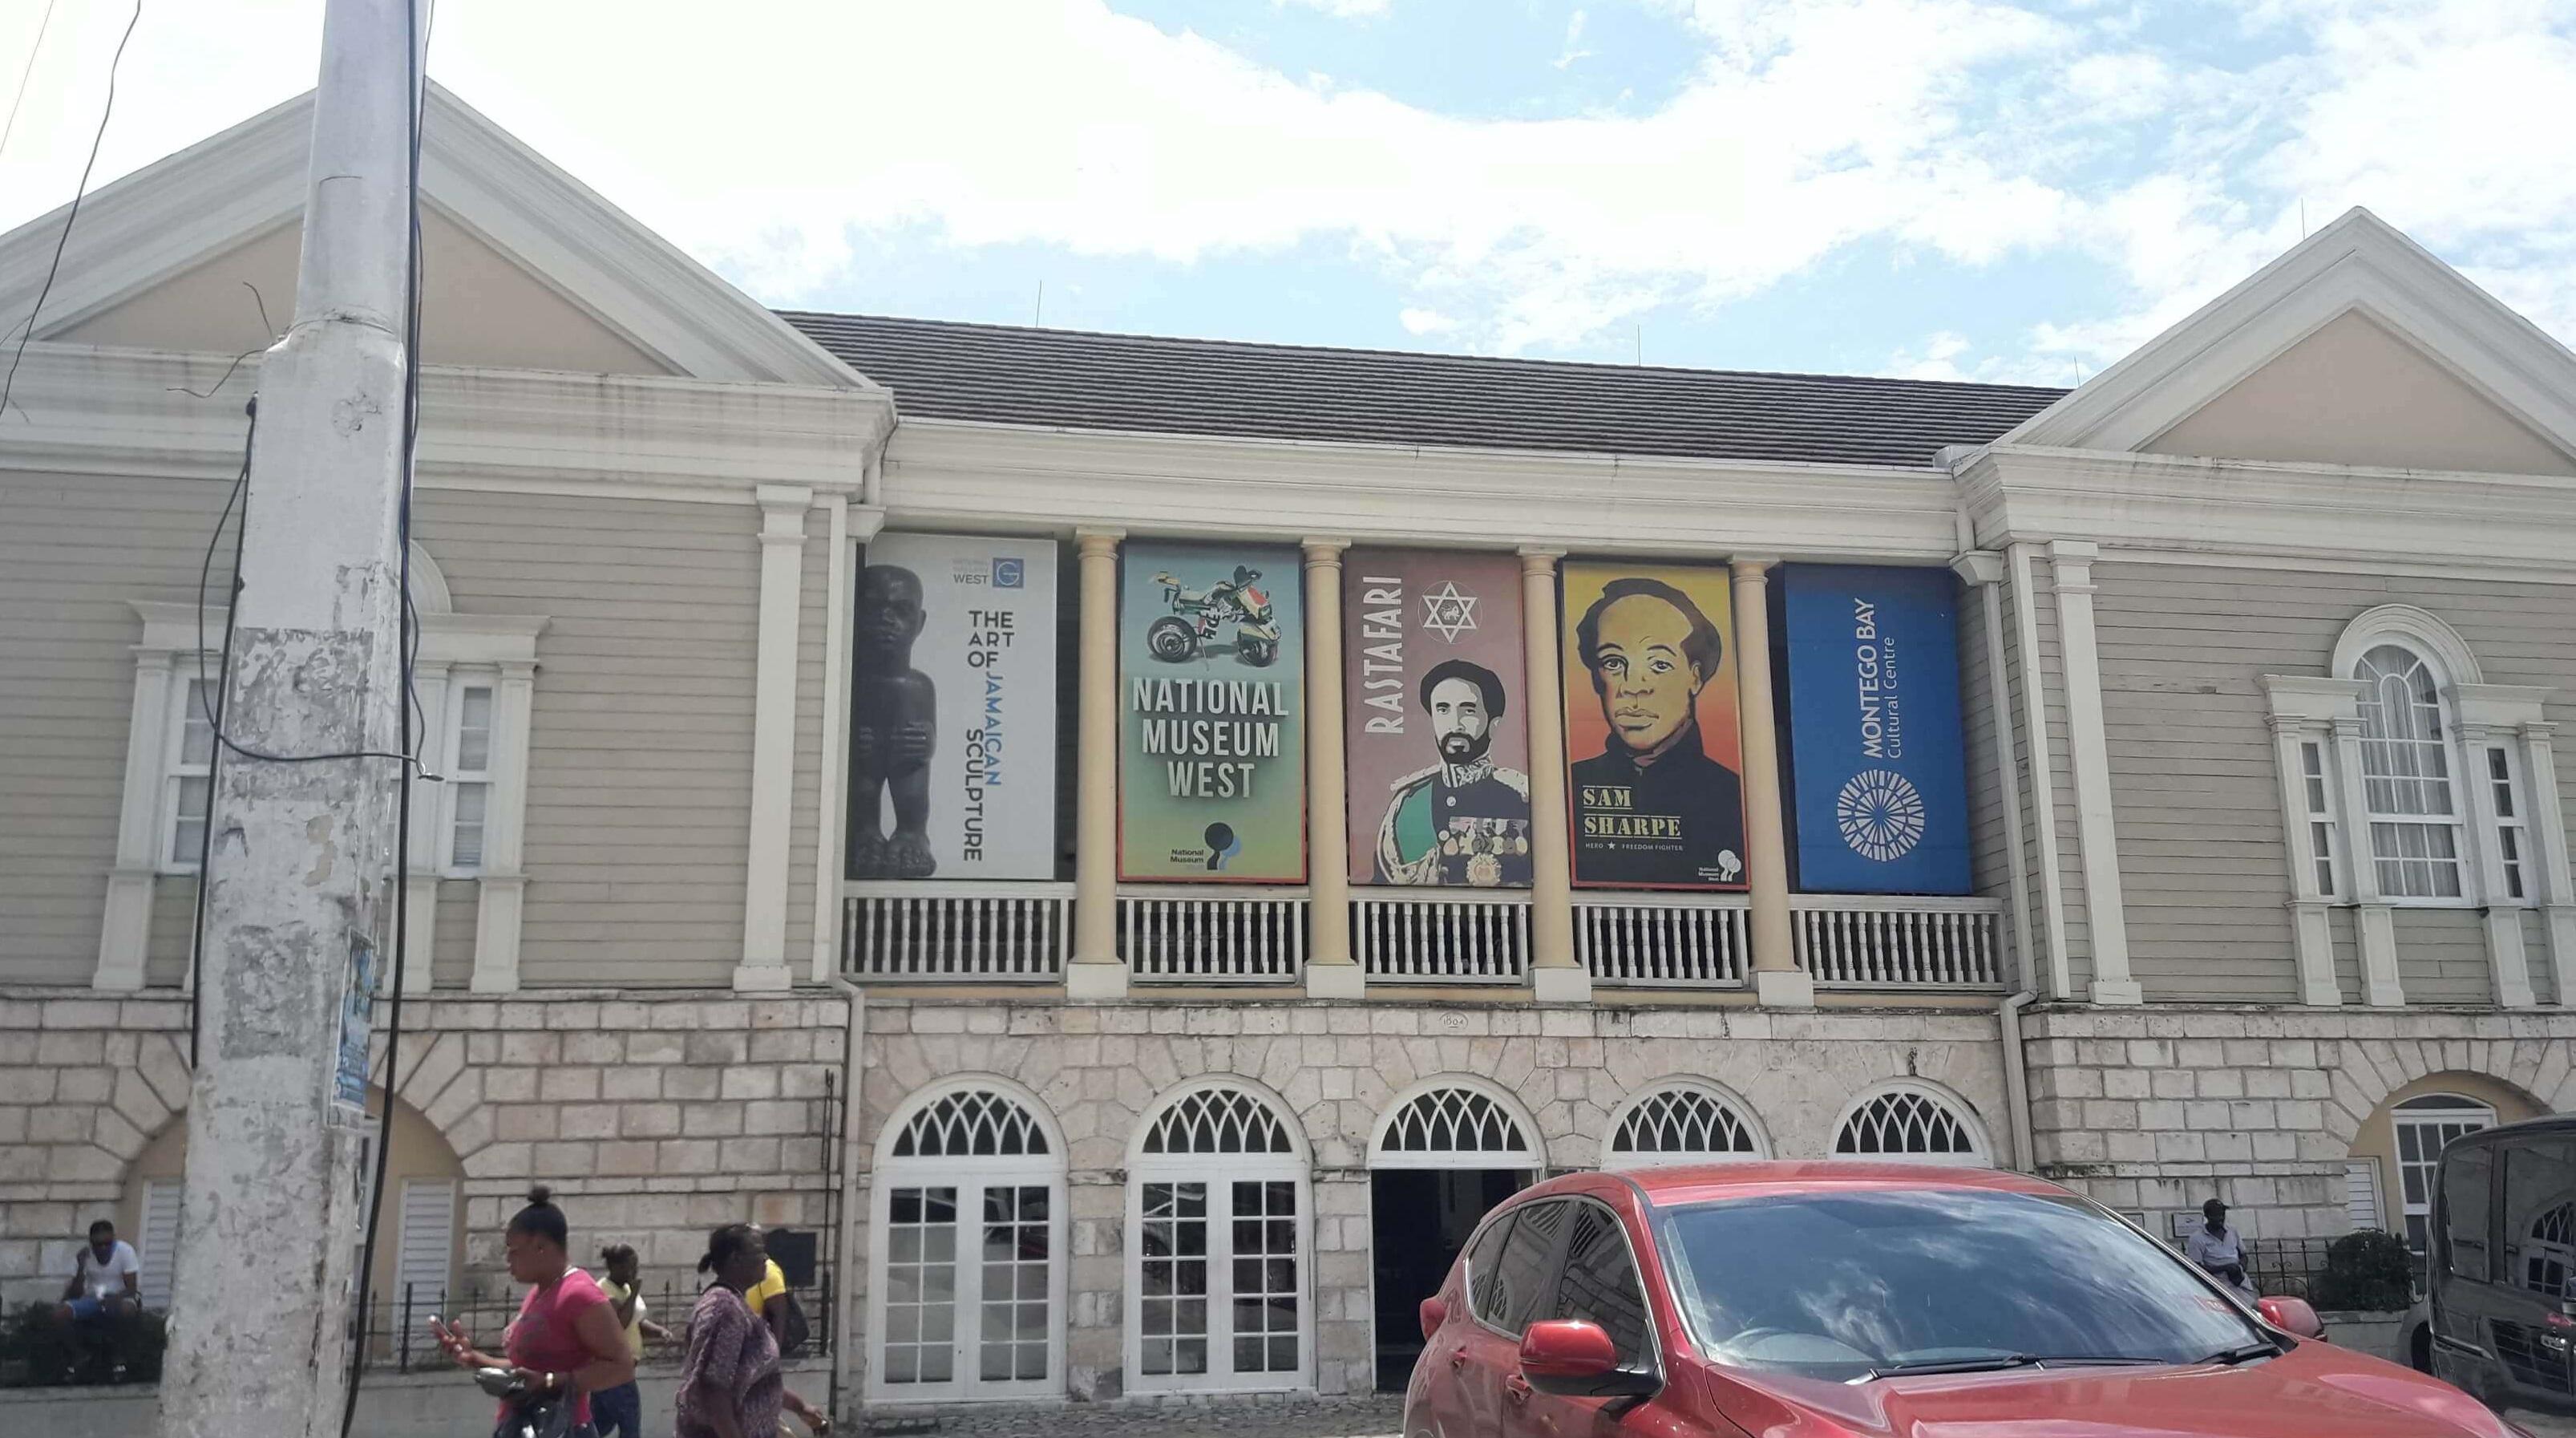 monteg_bay_jamaica_civic_center_nation_gallery_west